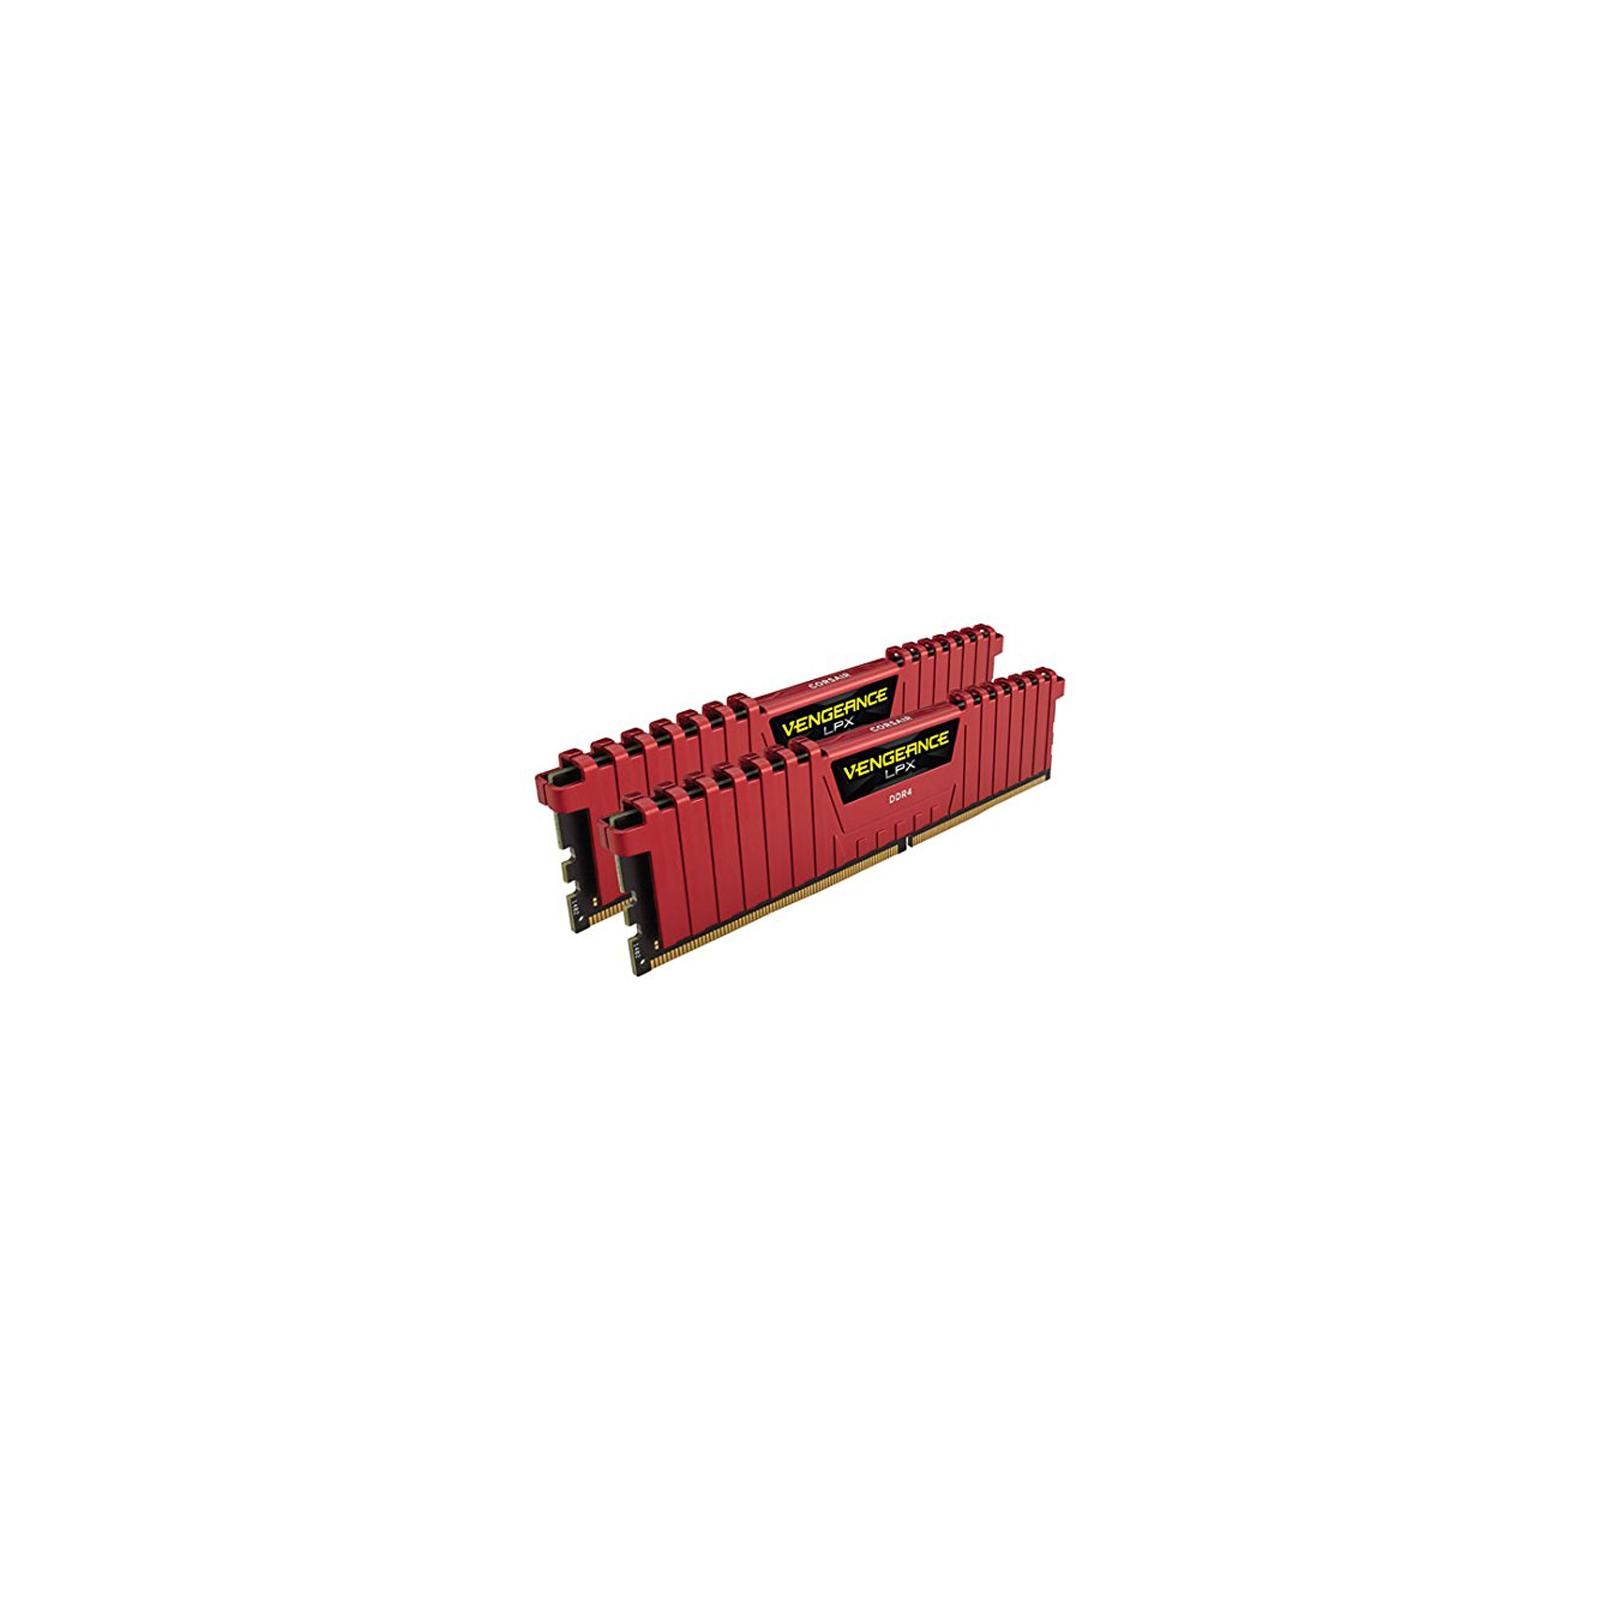 Модуль памяти для компьютера DDR4 16GB (2x8GB) 2666 MHz Vengeance LPX Red CORSAIR (CMK16GX4M2A2666C16R) изображение 3